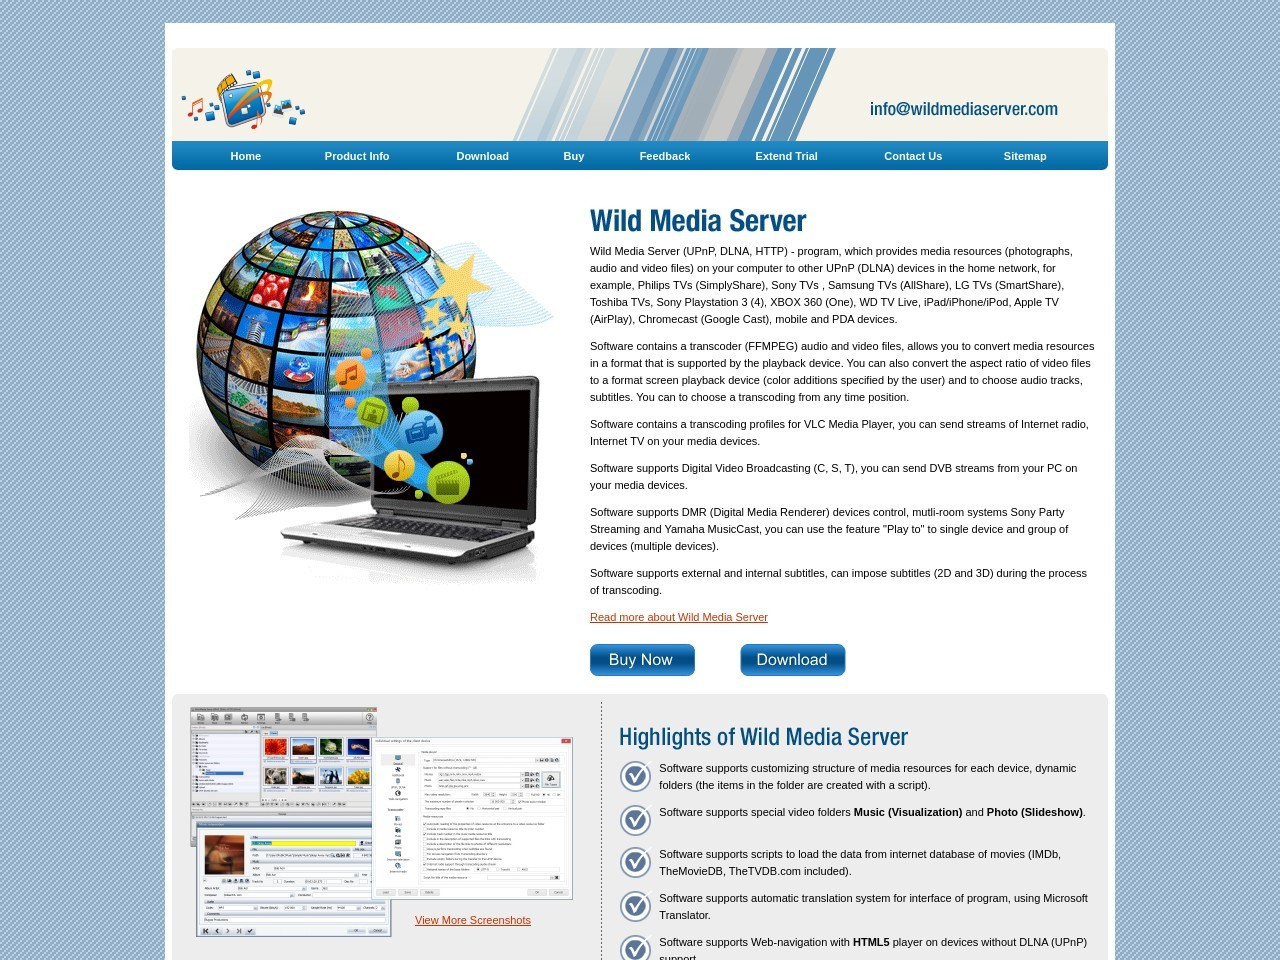 Wild Media Server